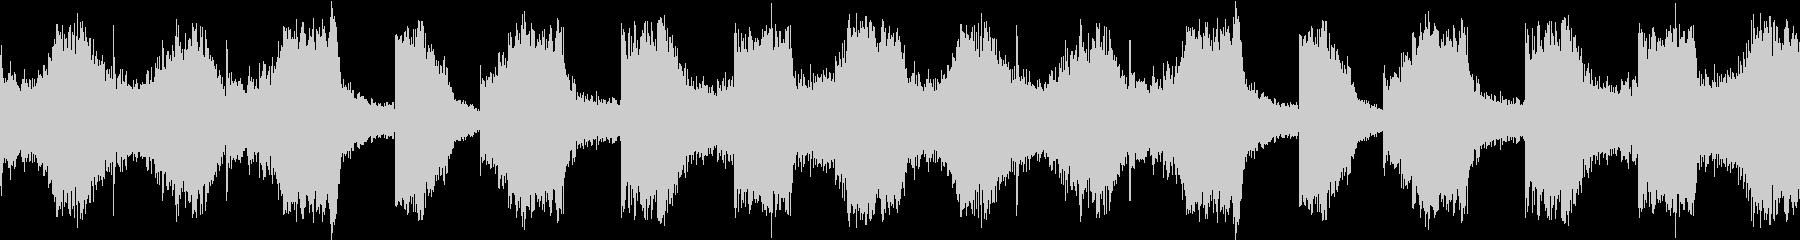 EDM リードシンセ 4 音楽制作用の未再生の波形